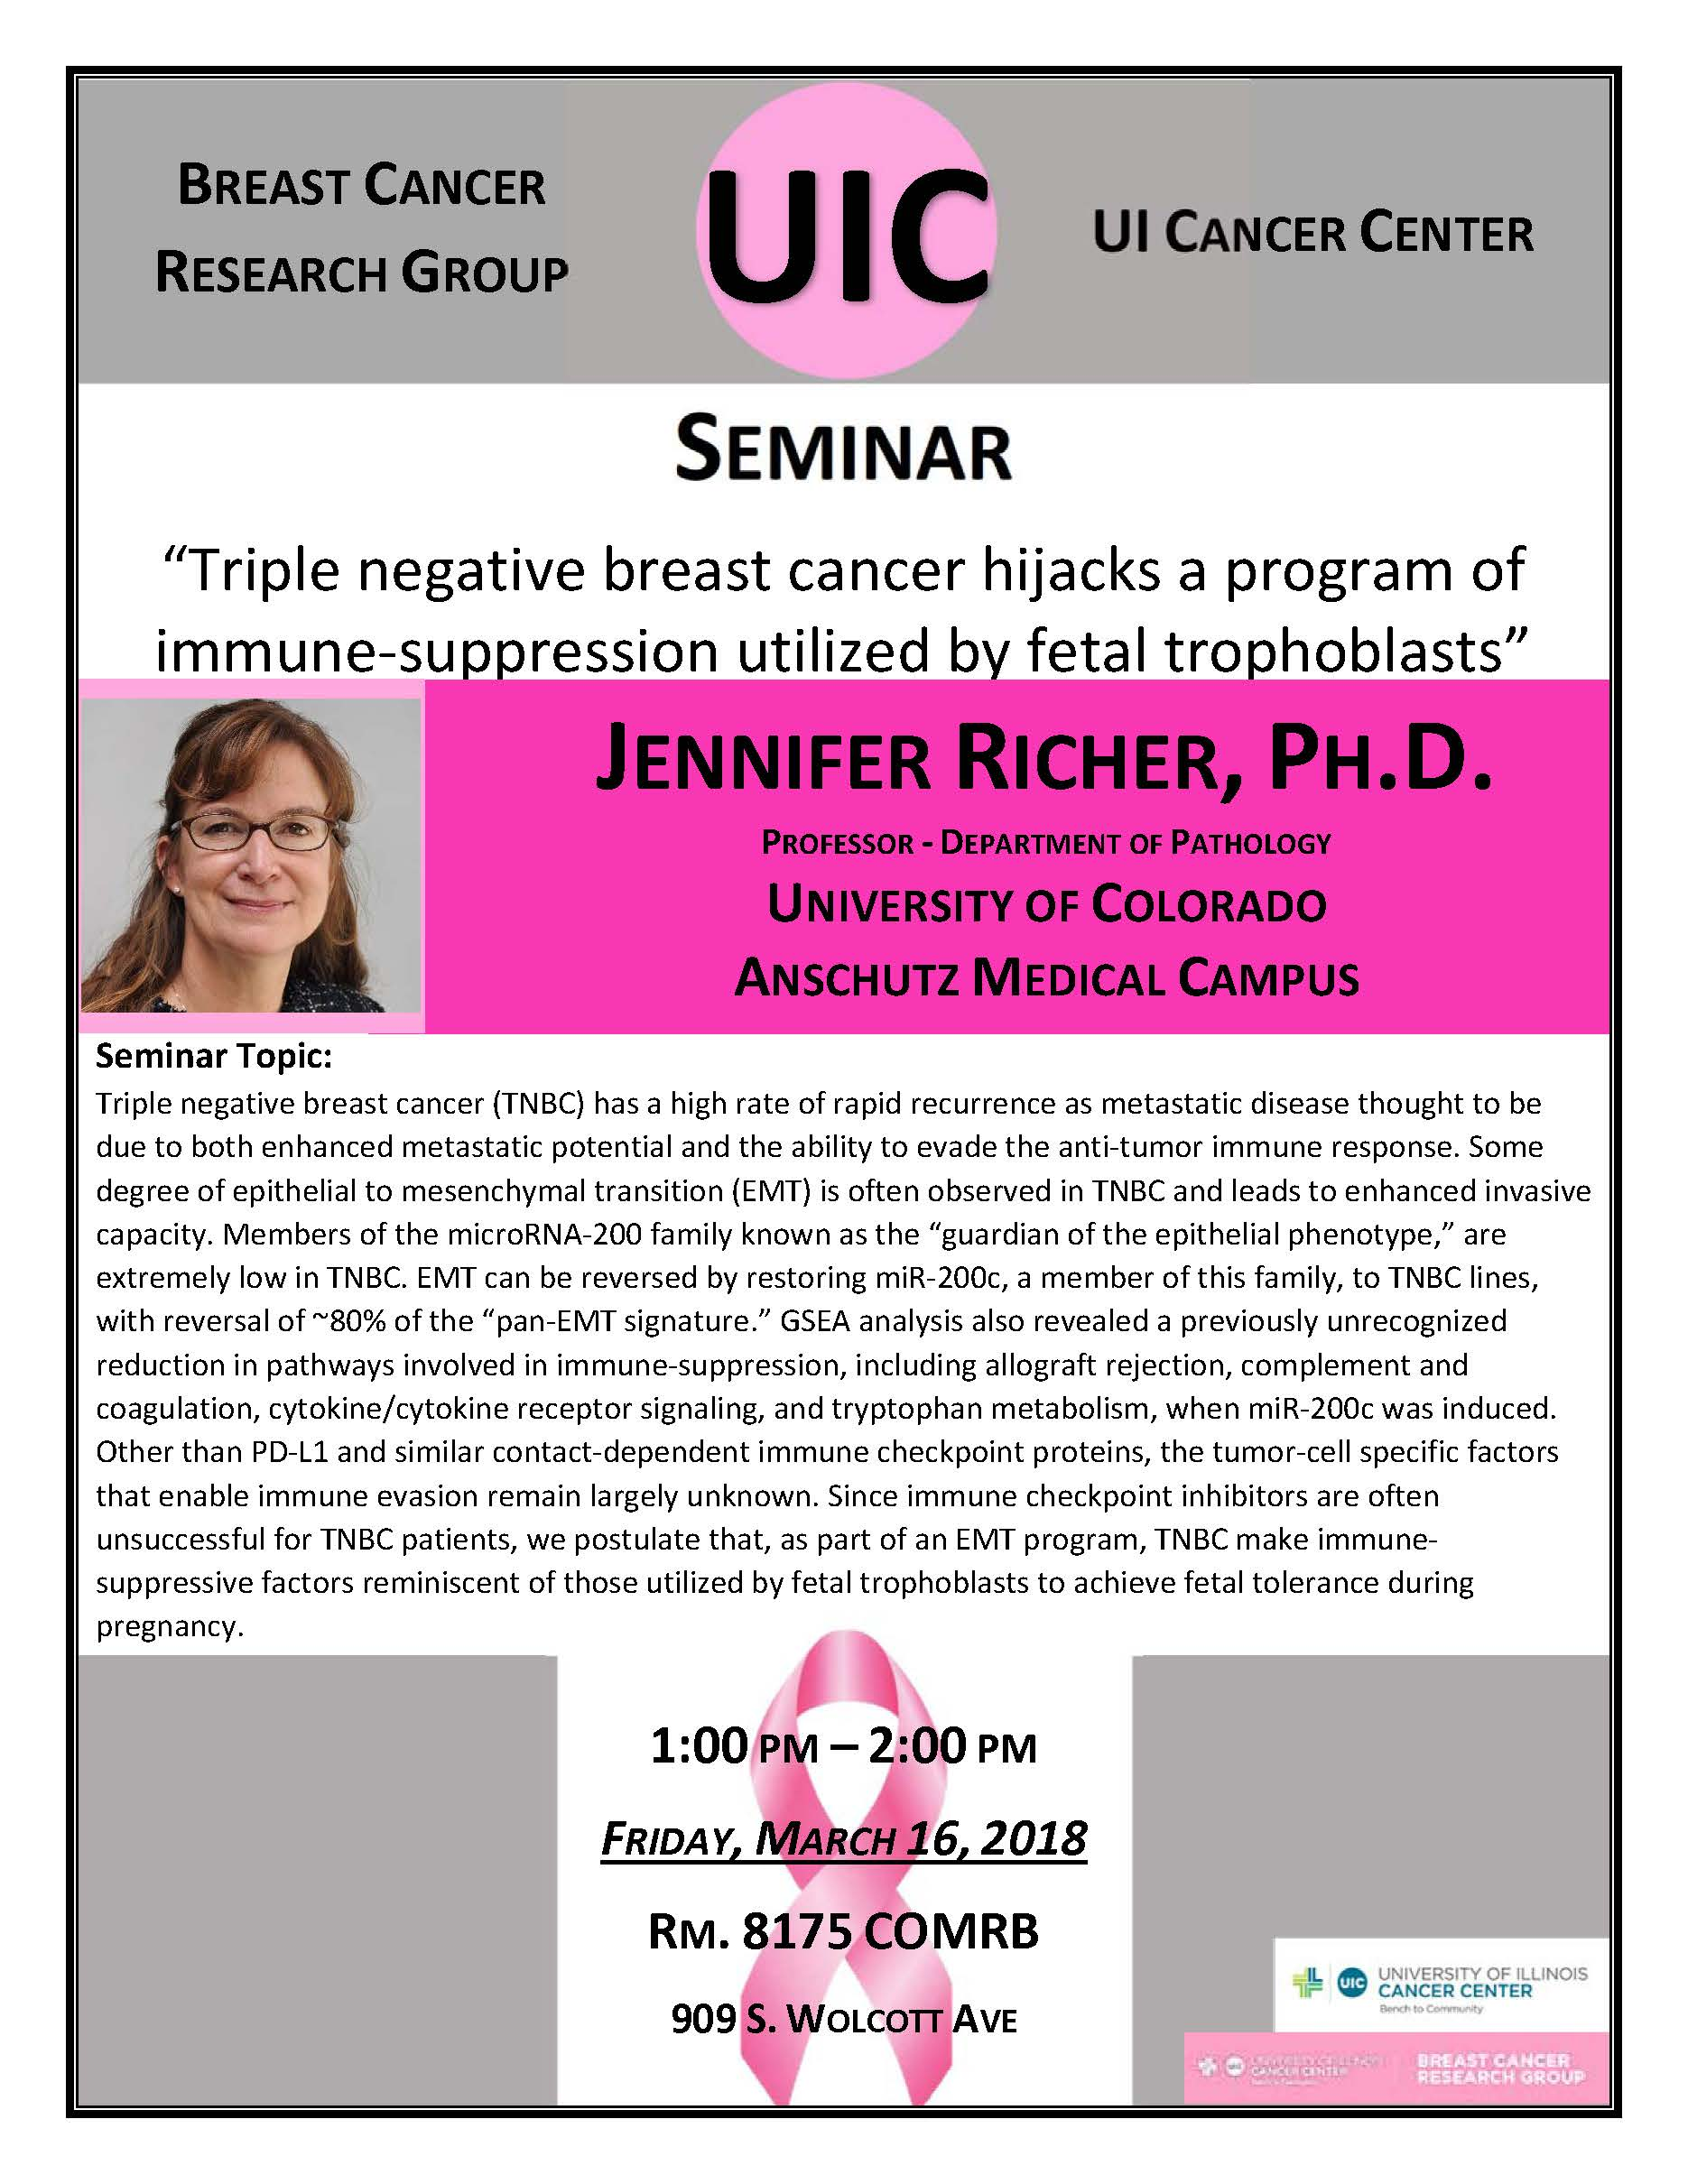 BCRG Seminar Flyer_Richer.jpg